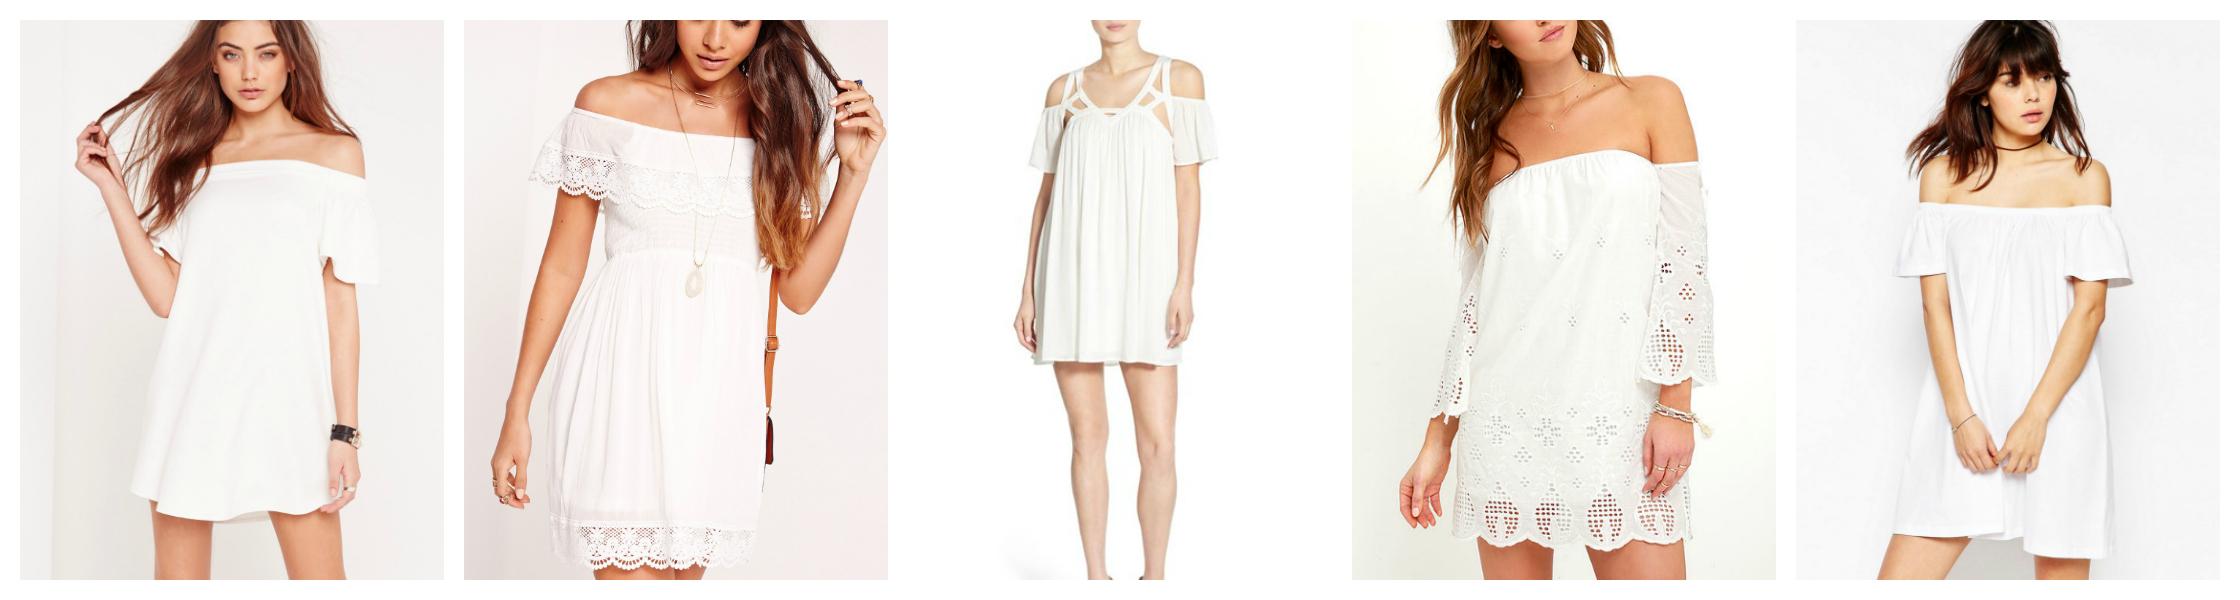 White Off the Shoulder Dresses